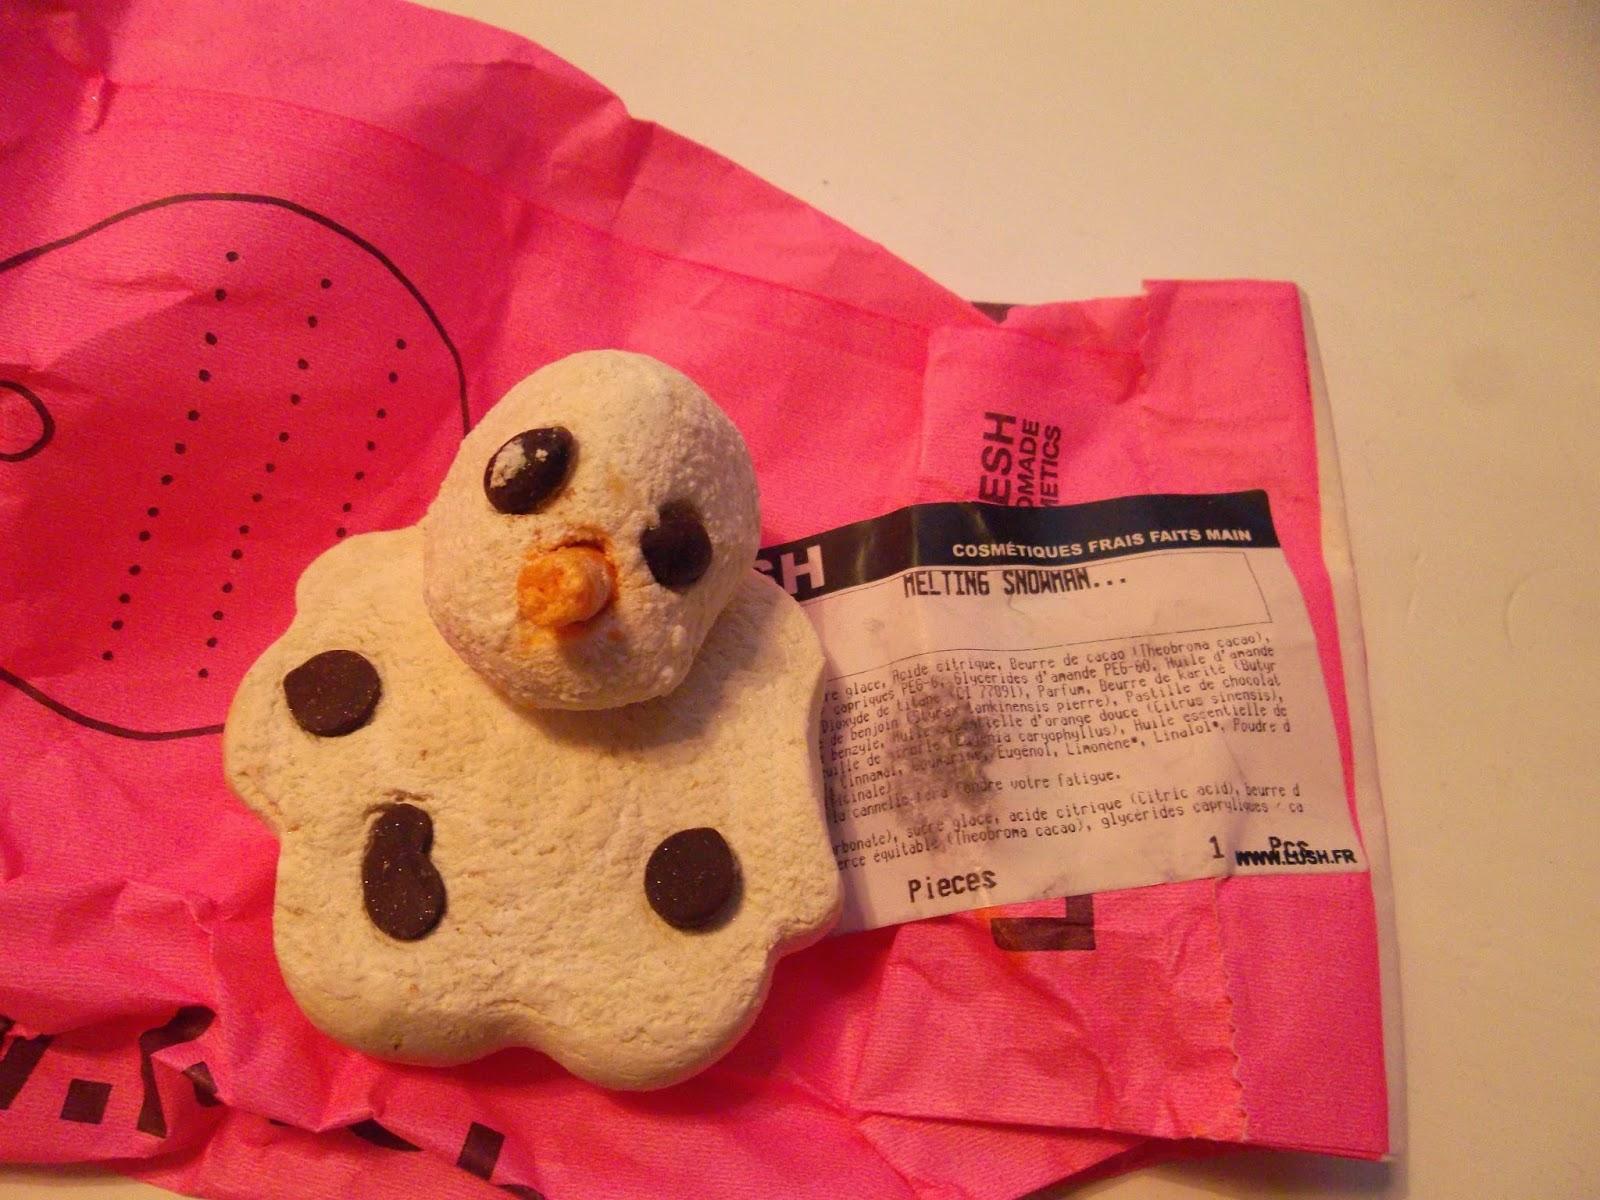 http://www.verodoesthis.be/2015/04/julie-lush-melting-snowman-bath-melt.html